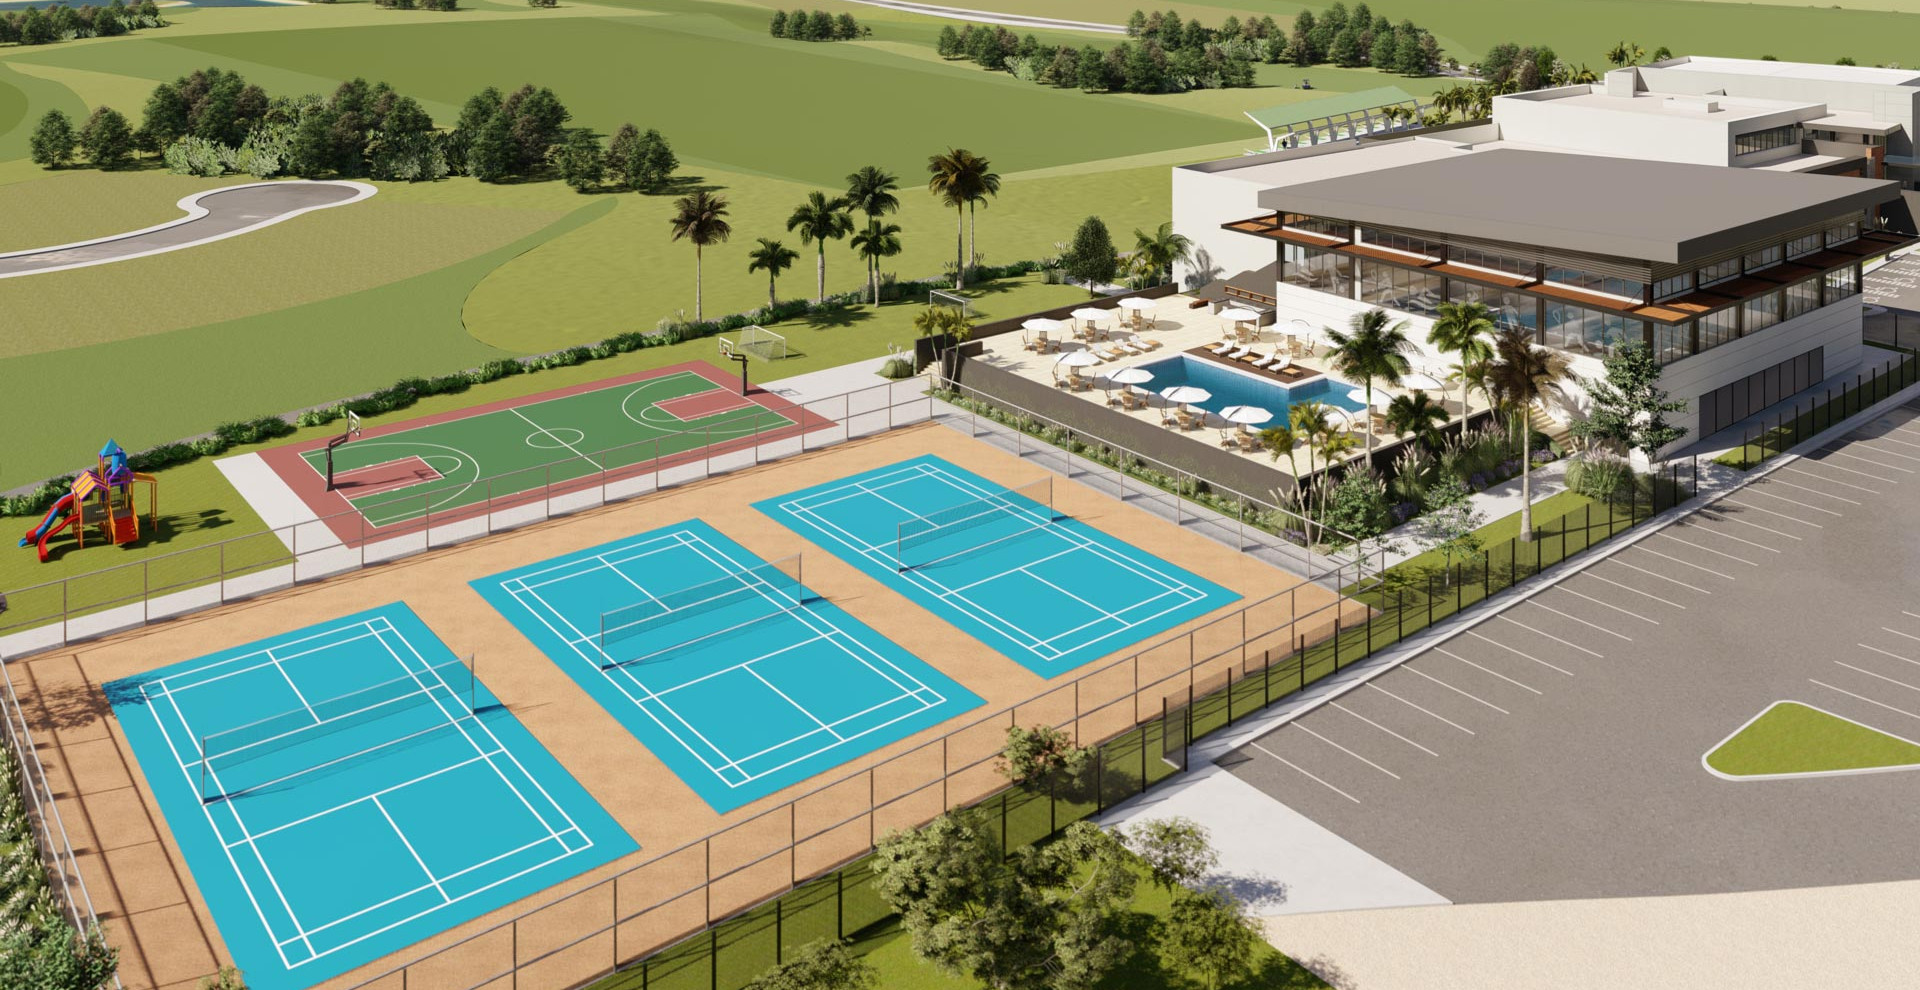 Area deportiva y recreativa